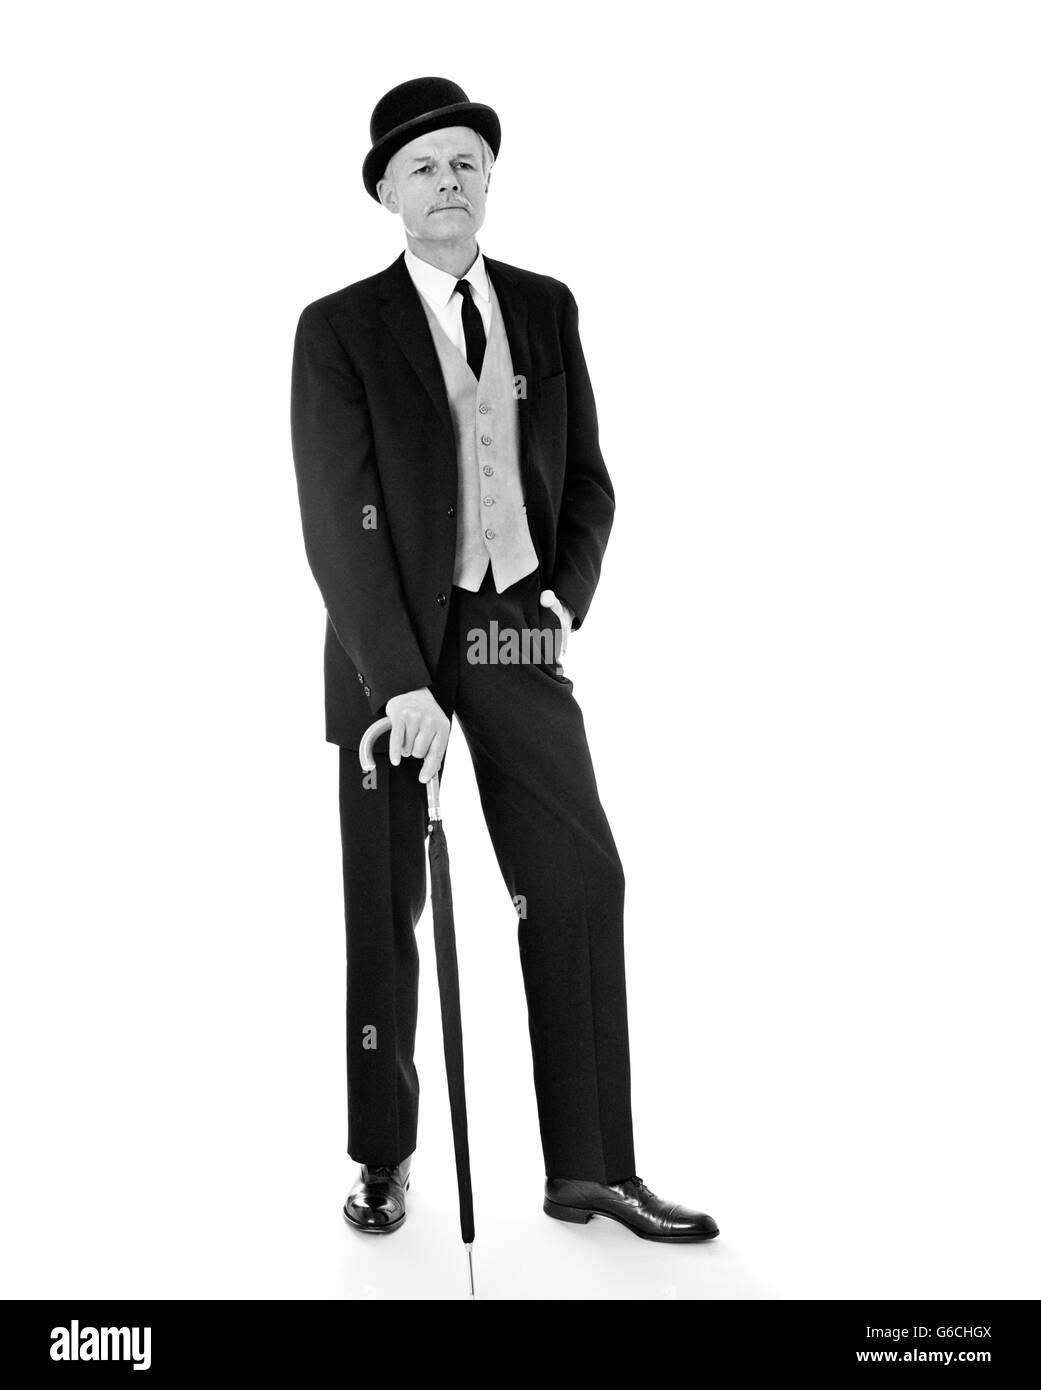 768254153c2 1960s PORTRAIT FULL LENGTH MAN WEARING THREE PIECE SUIT BOWLER HAT HOLDING  AN UMBRELLA VERY BRITISH ENGLISH LOOK